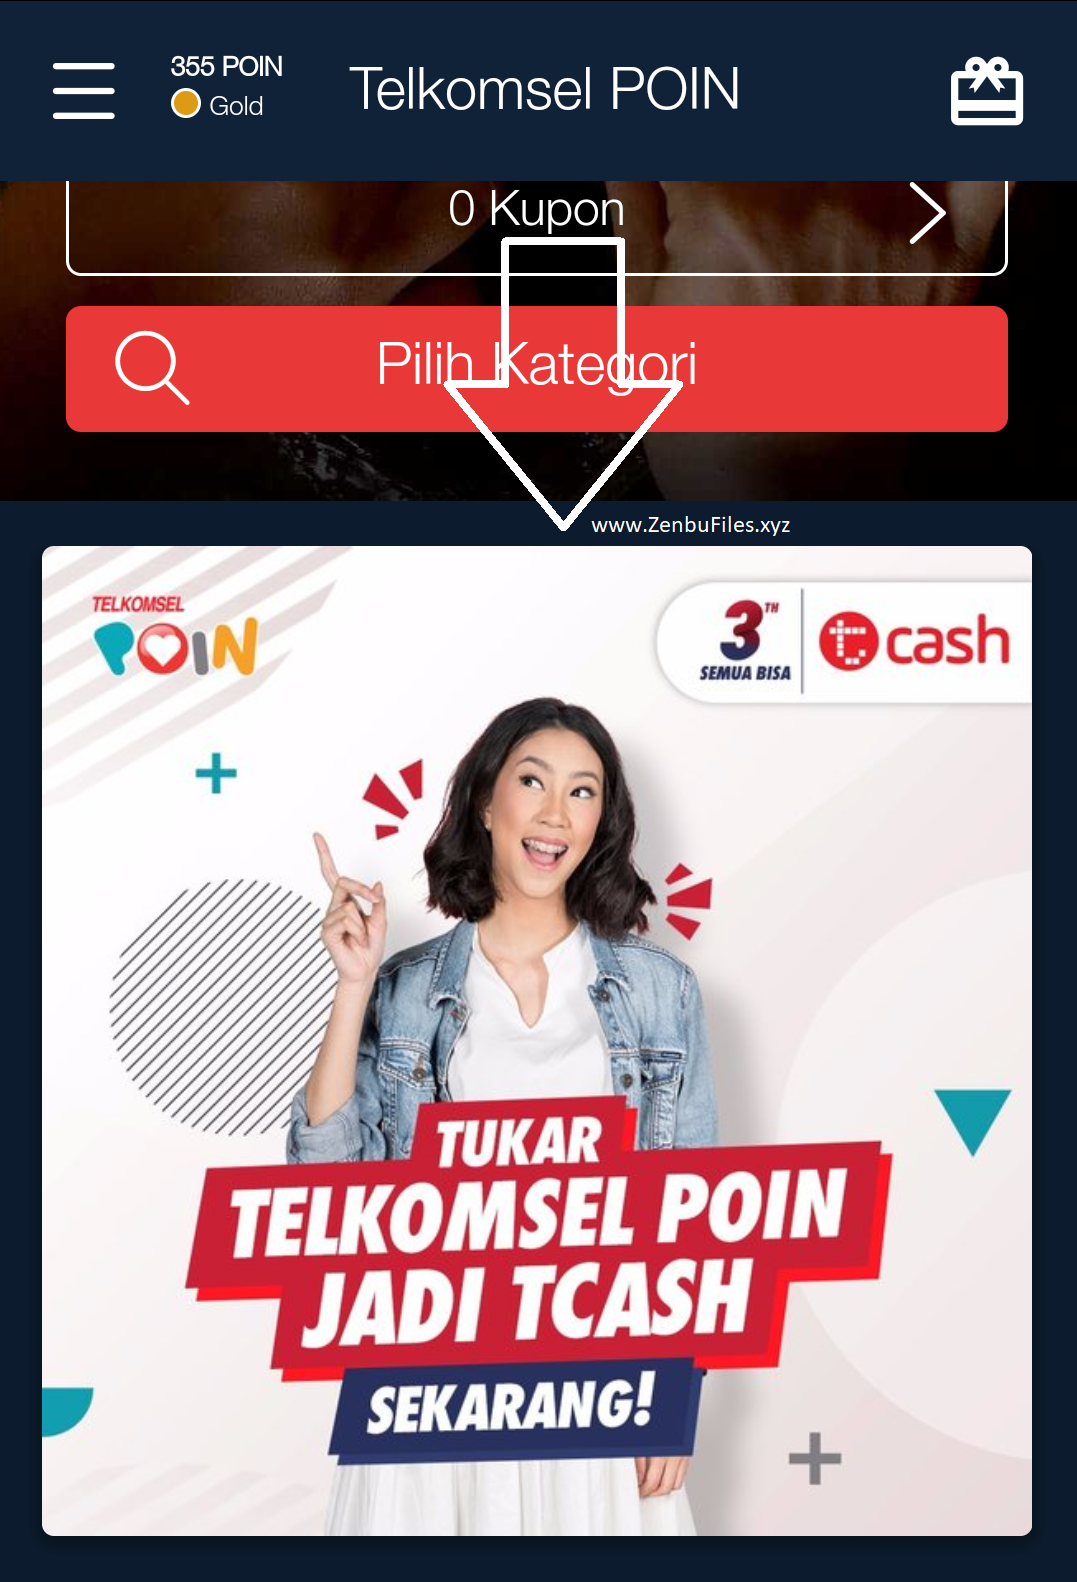 Zenbu Files: Diamond Mobile Legends Gratis dari Telkomsel Poin